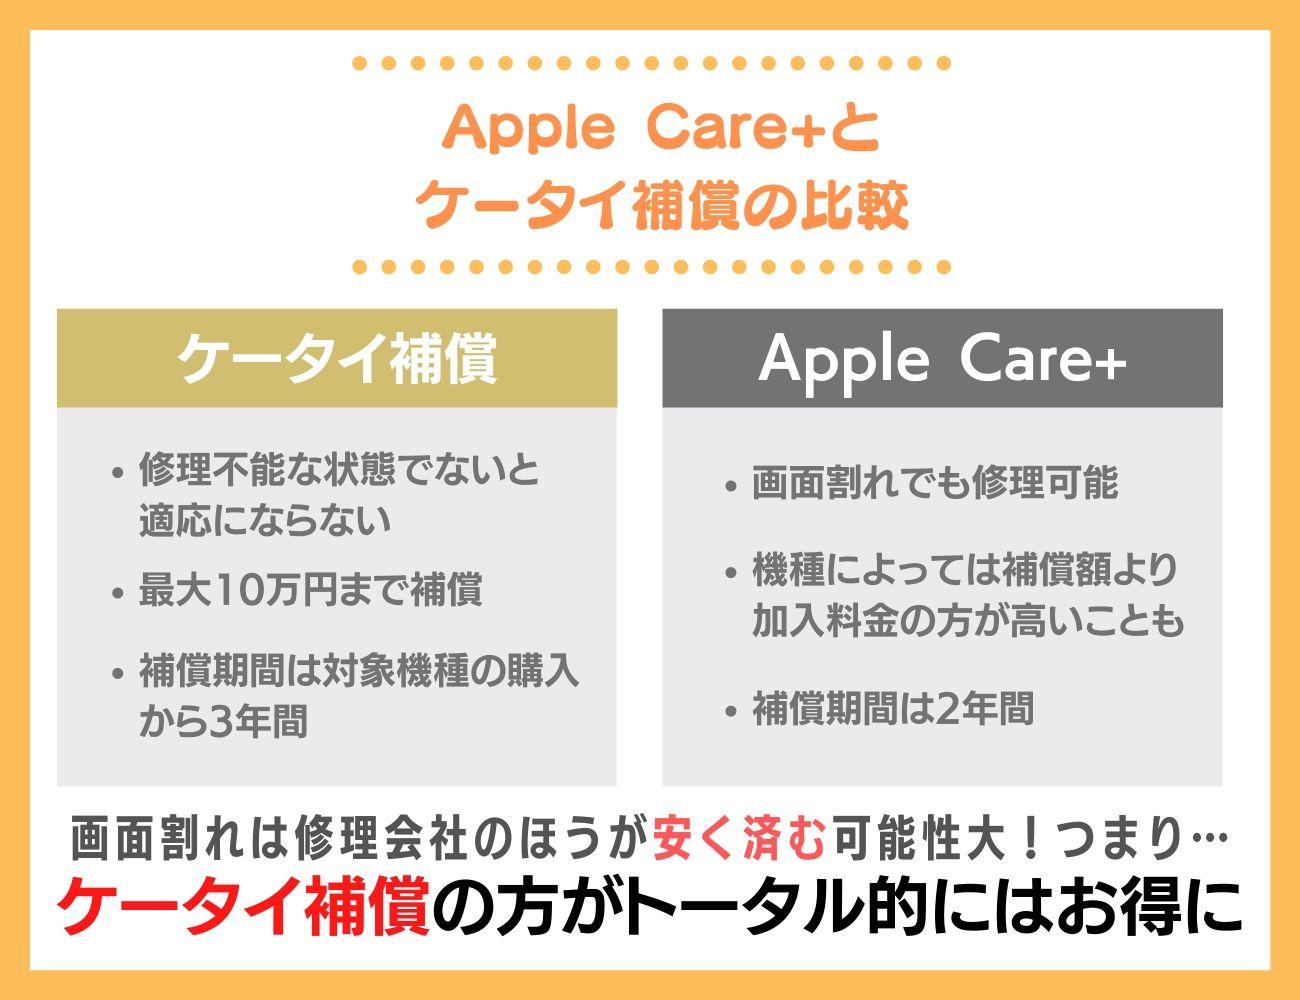 iPhone保持者必見!Apple Careとケータイ補償を比較